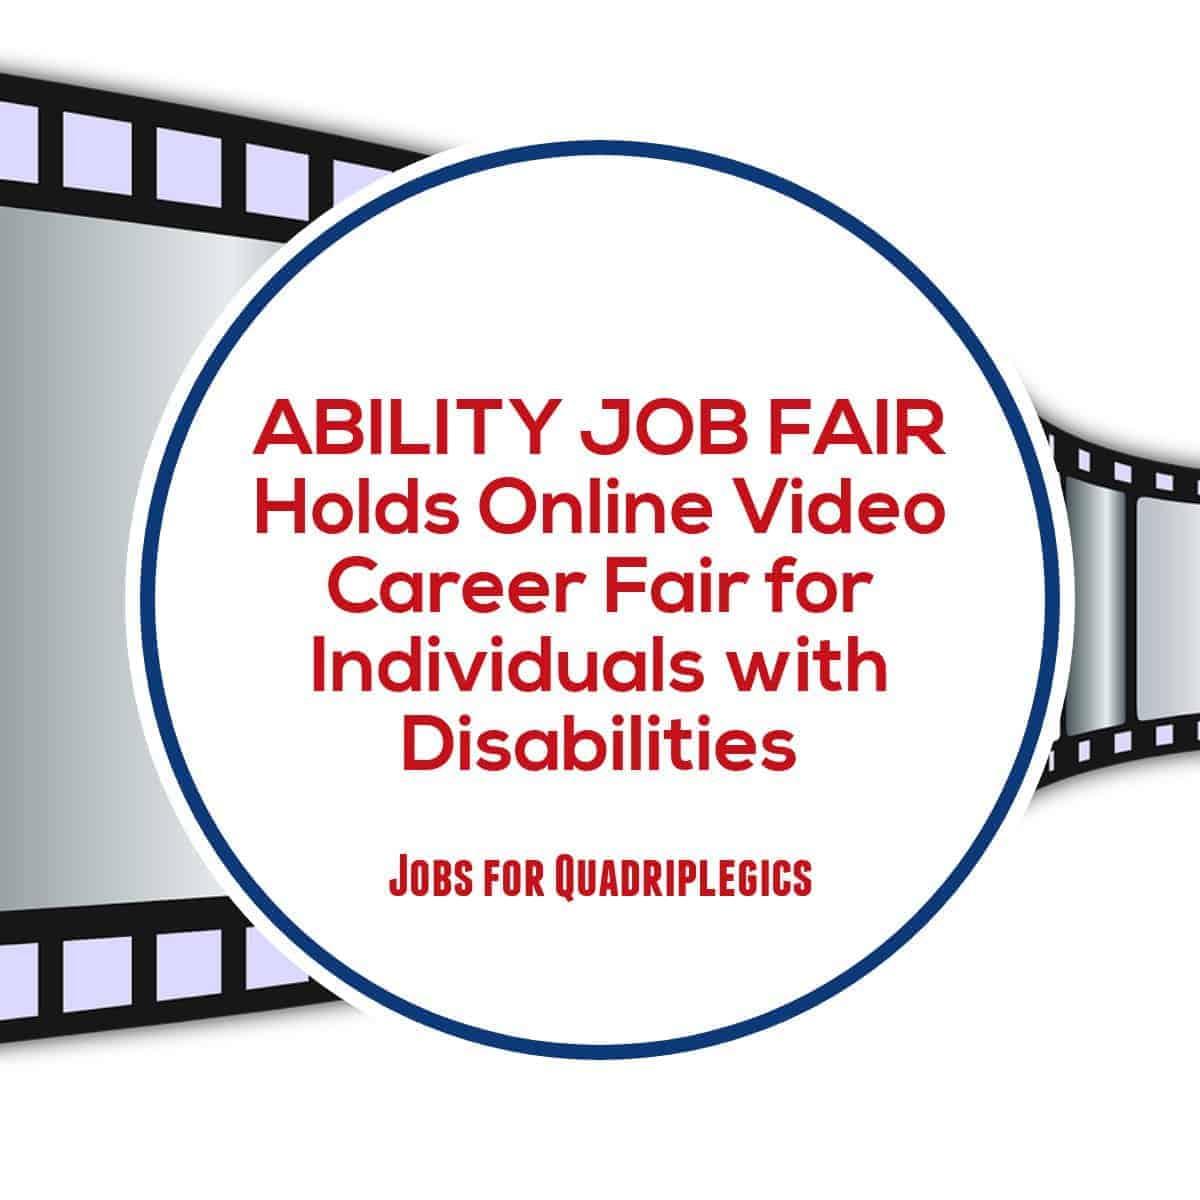 Job Opportunities for Quadriplegics